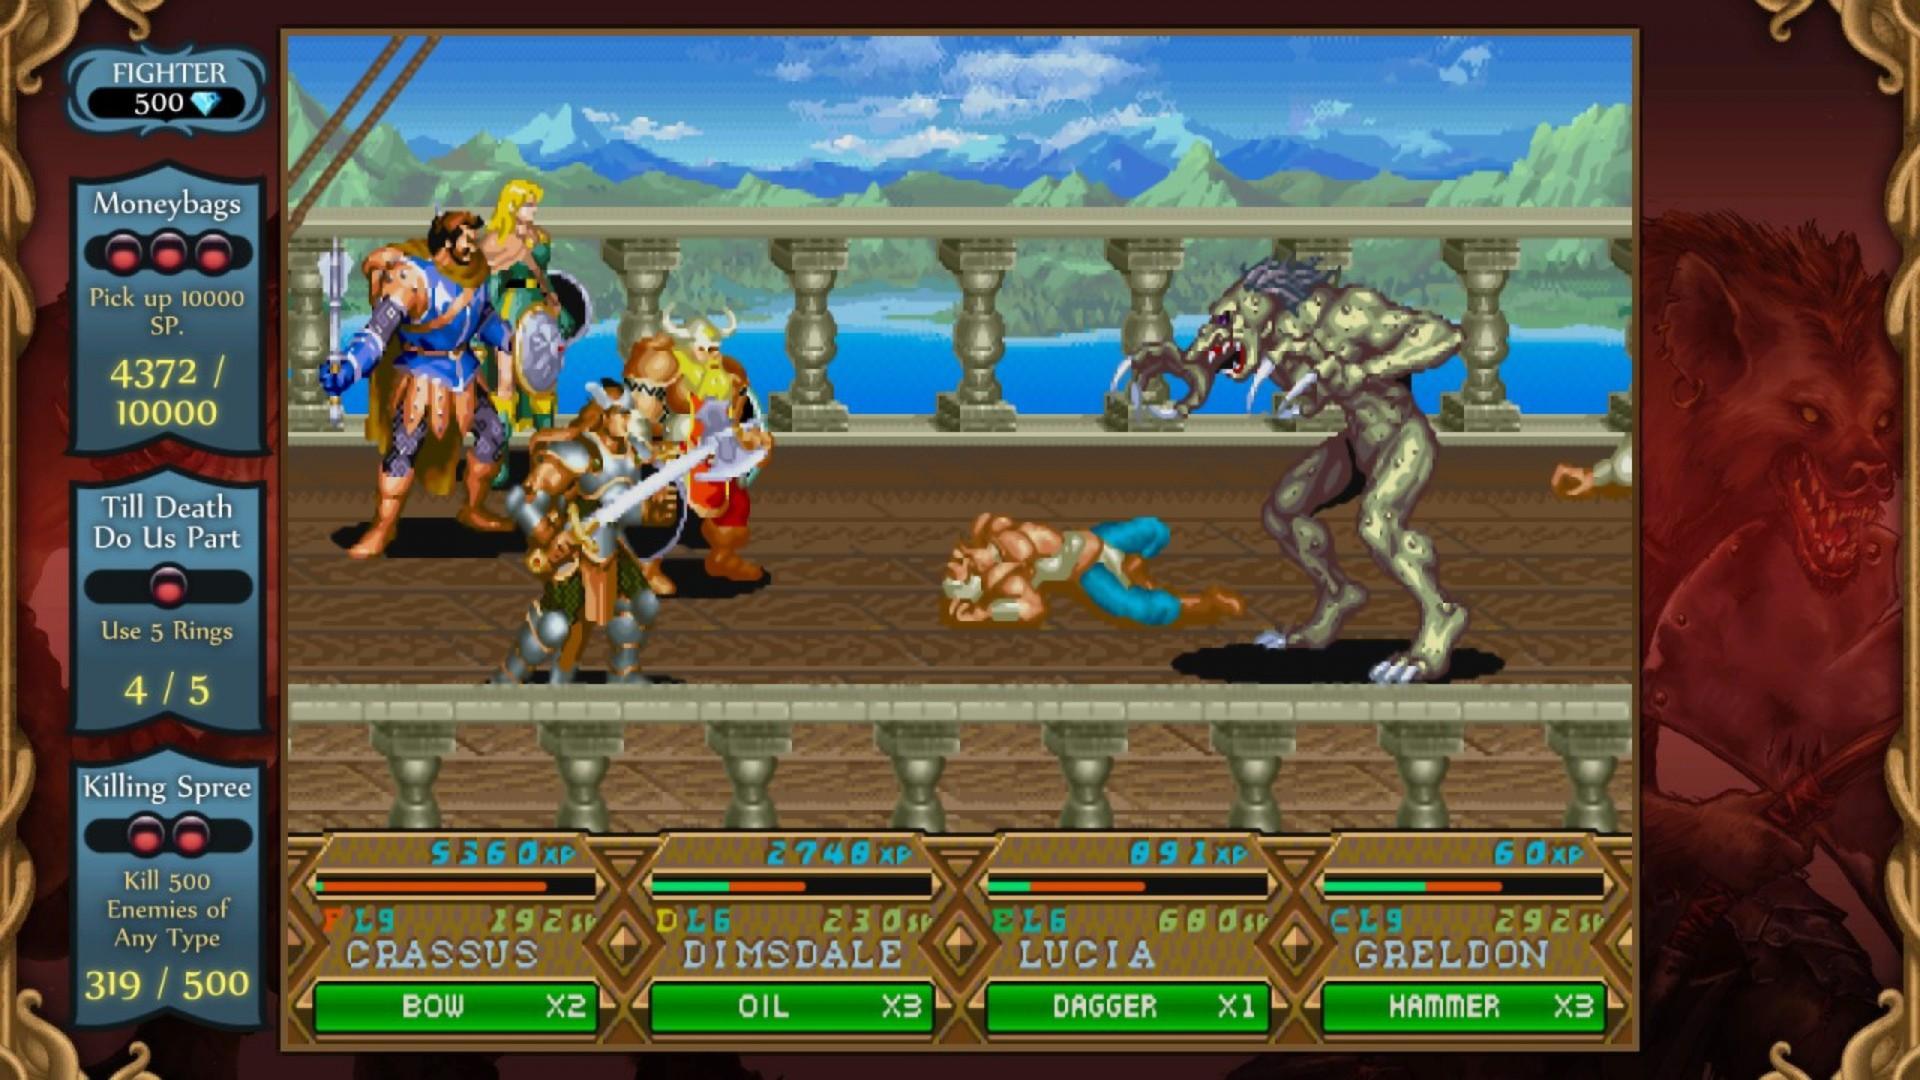 Dungeons & Dragons: Chronicles of Mystara Fiyat Karşılaştırma